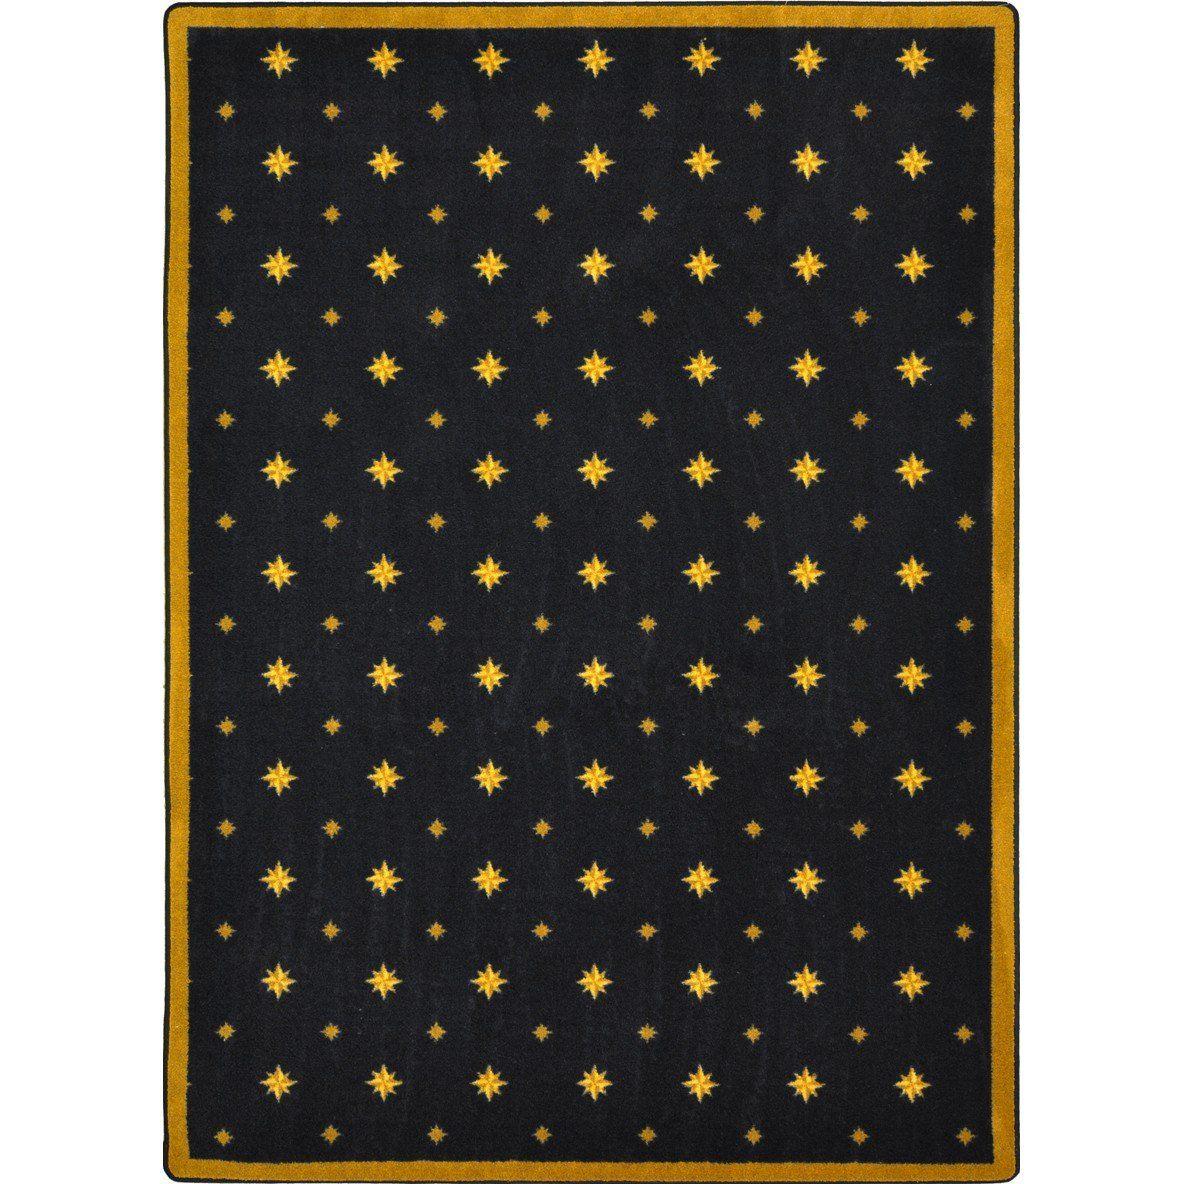 Joy carpets any day matinee walk fame theater